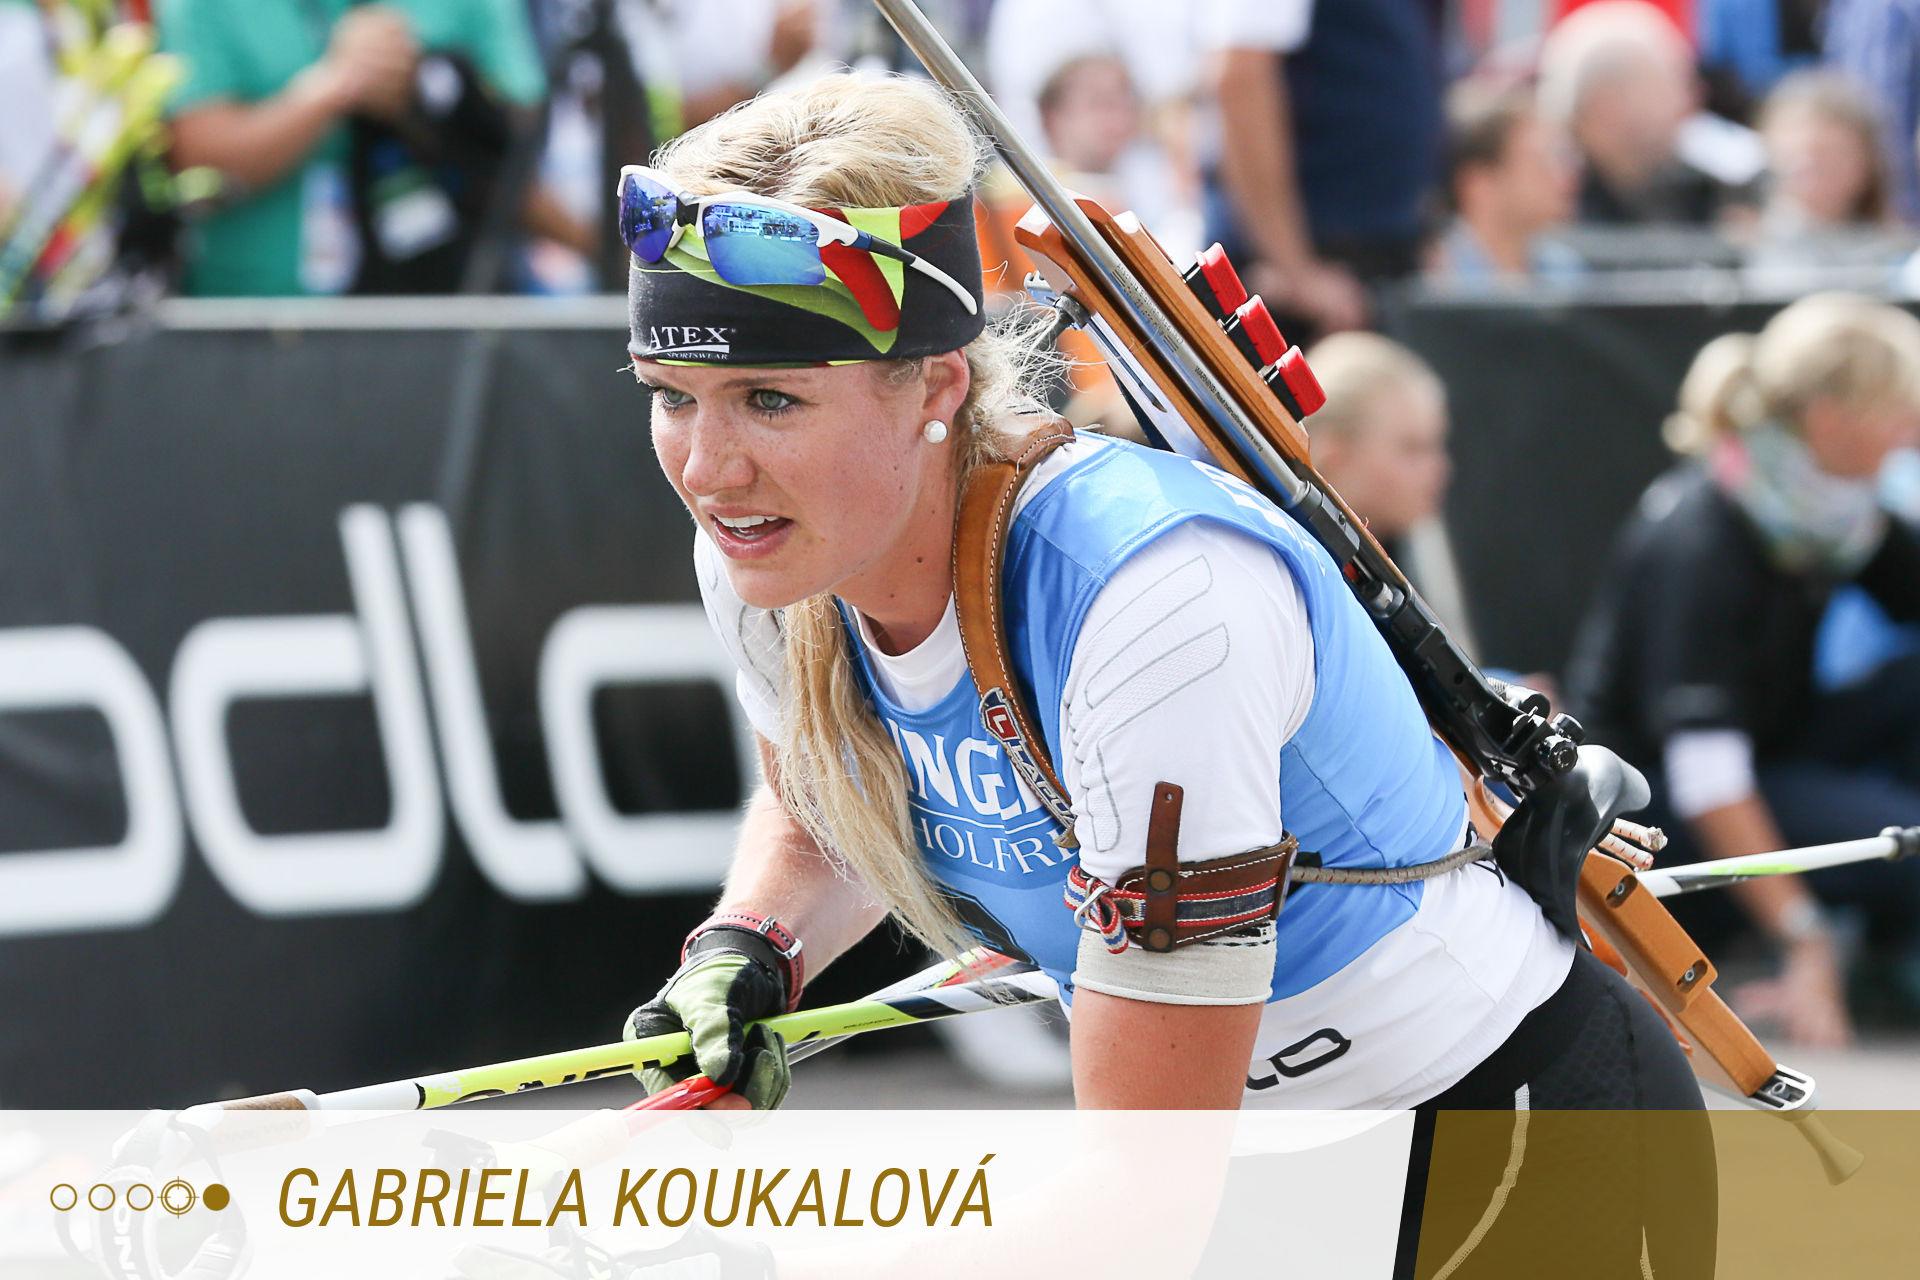 Athleten_Historie_GabrielaKoukalova